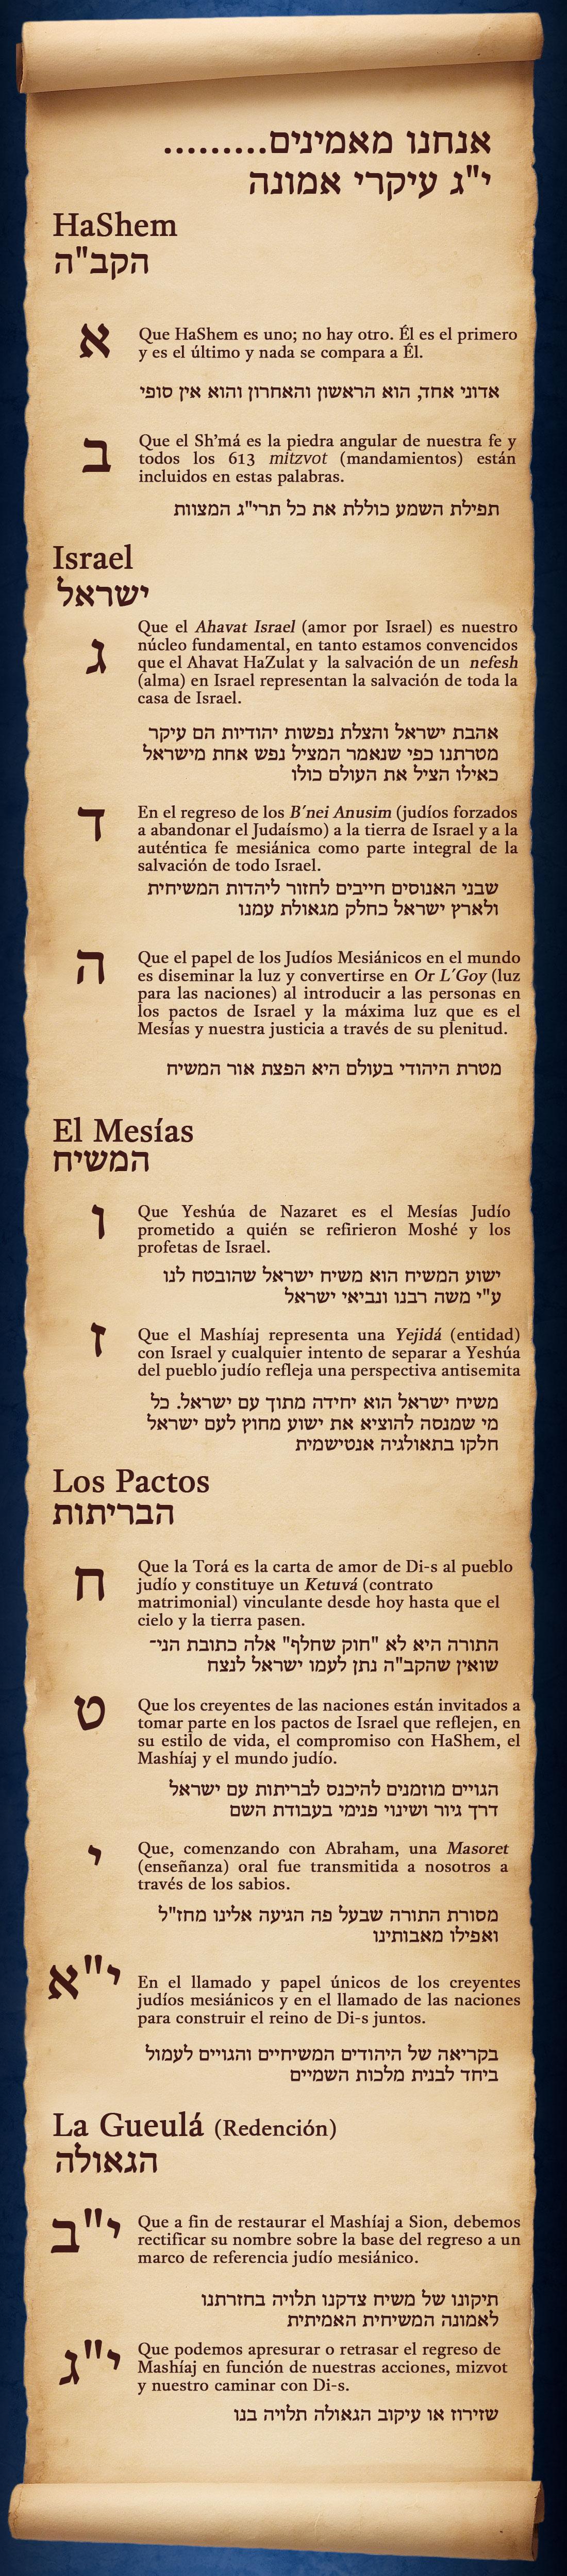 img_shuvu_principles_of_faith_spanish